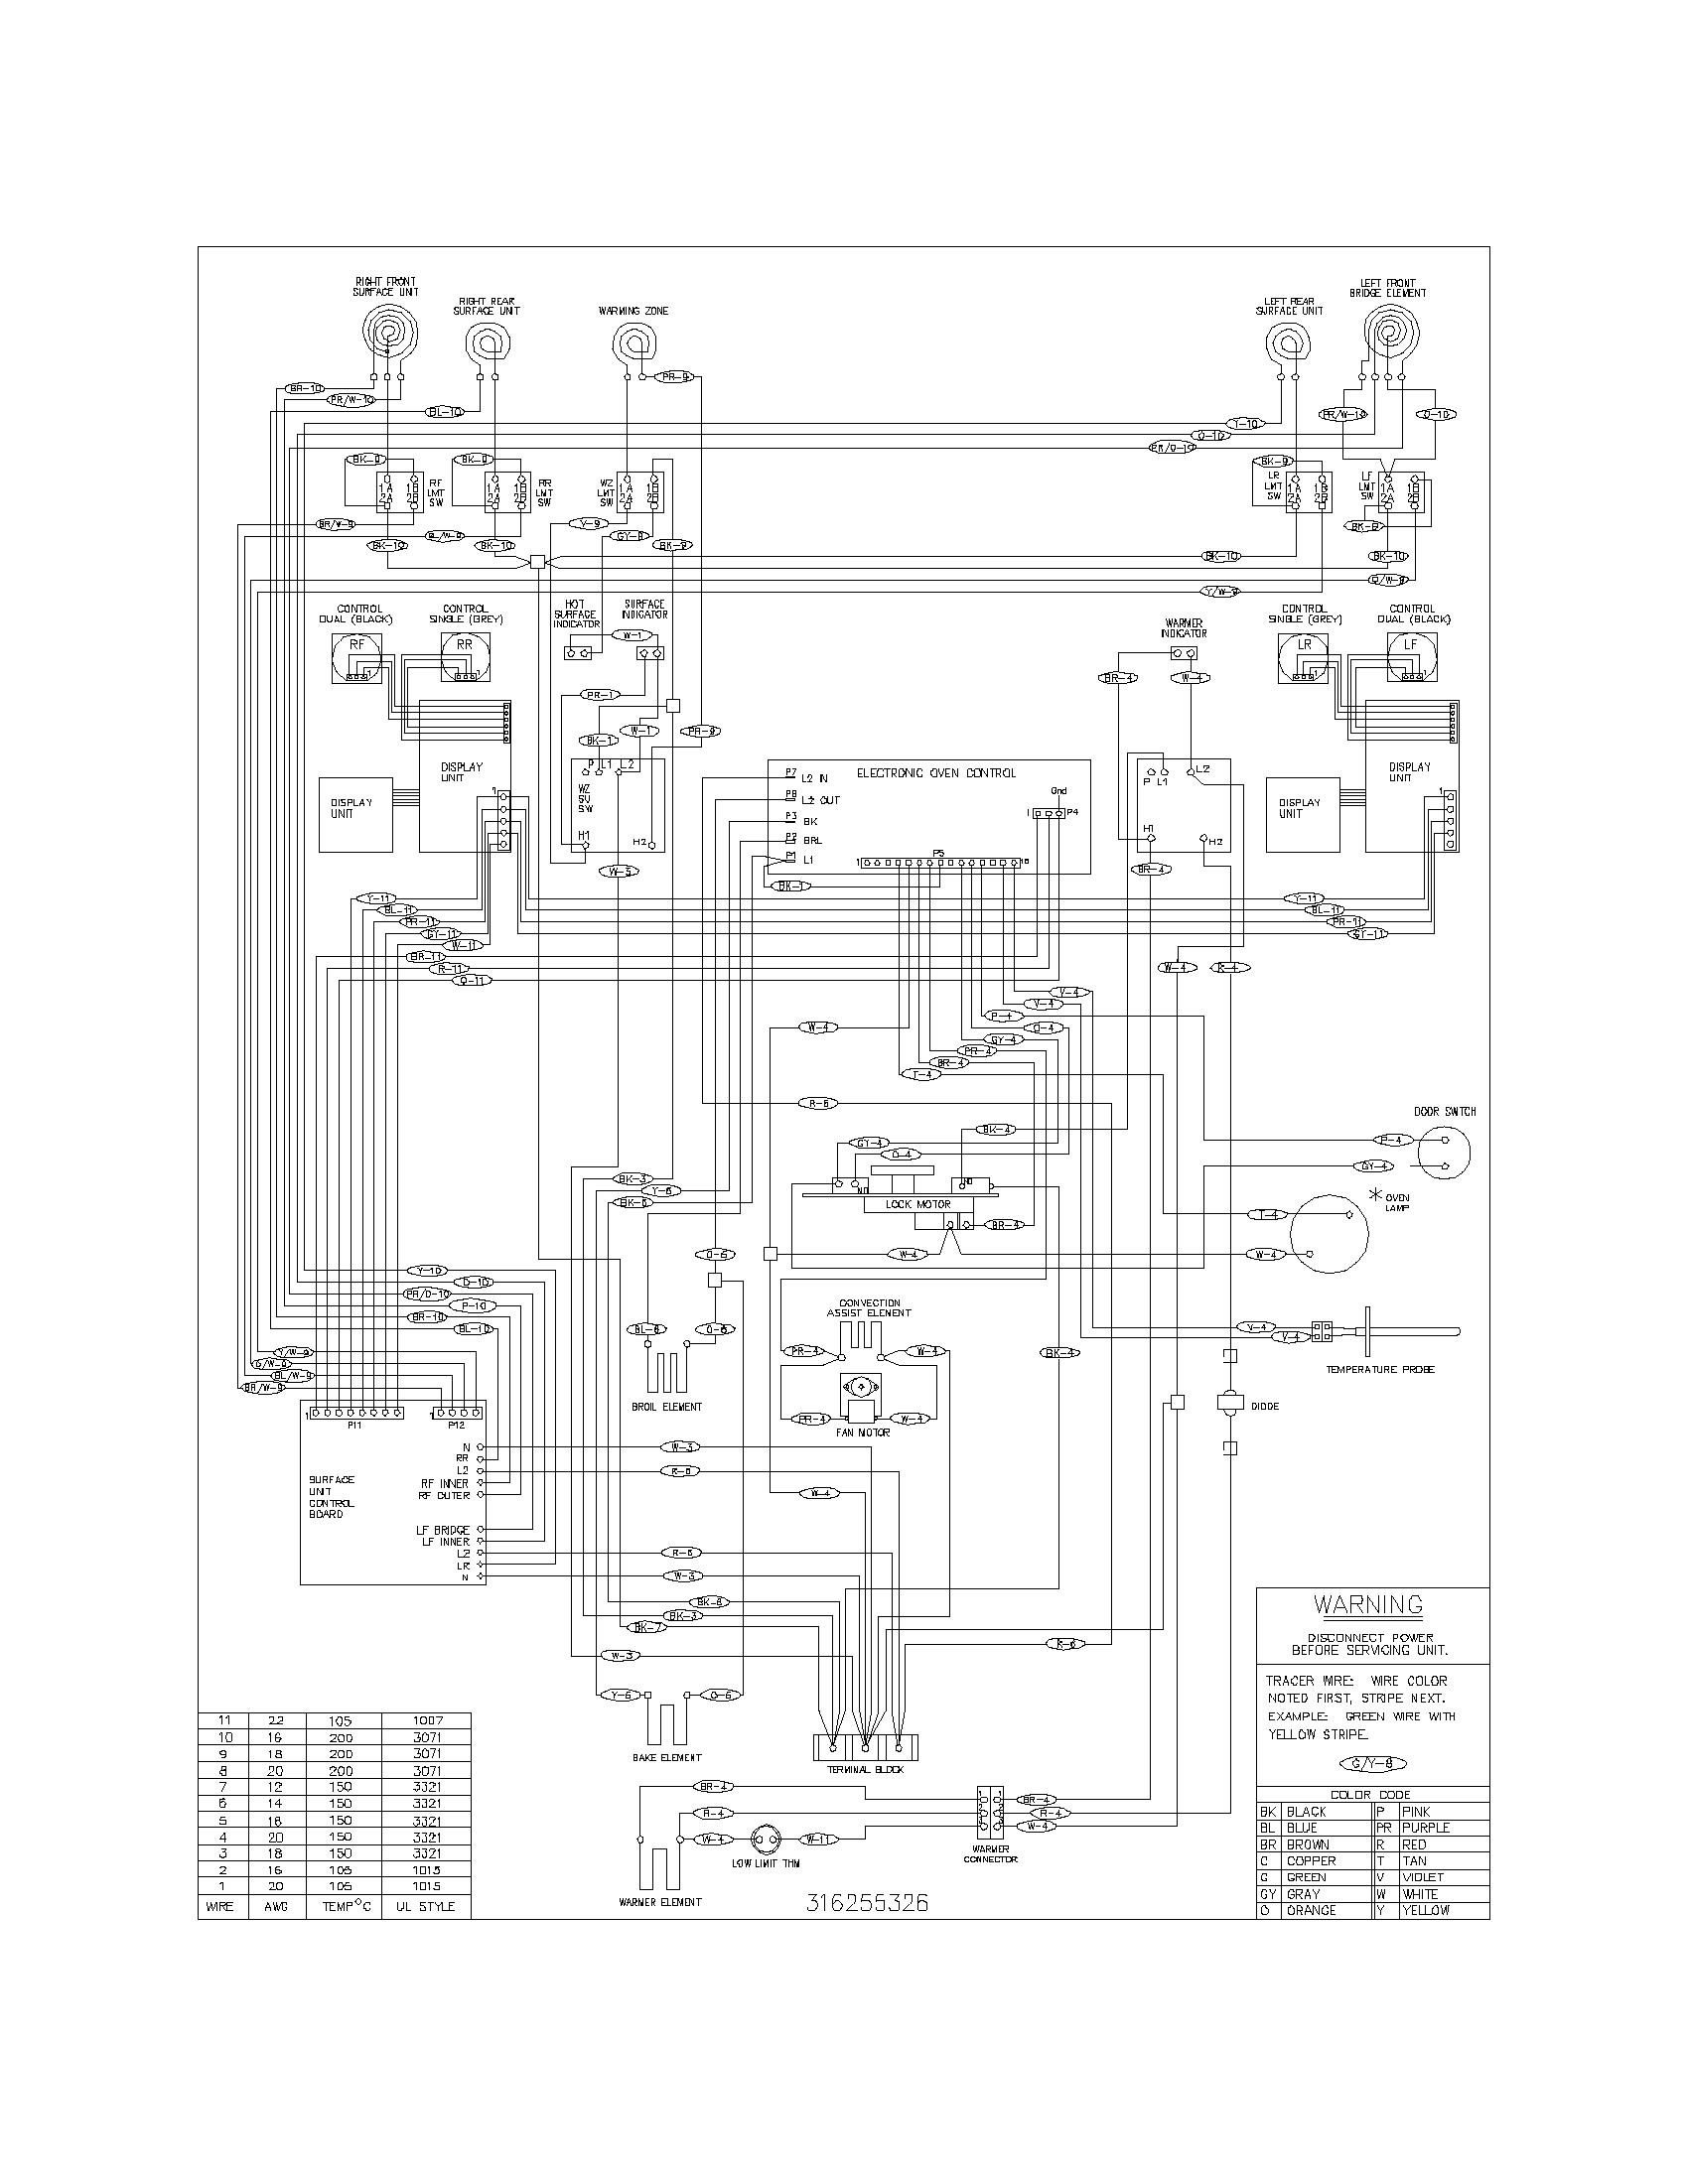 [SCHEMATICS_4UK]  Case 450c Wiring Diagram.html - wiring diagrams schematics | Skyteam T Rex Wiring Diagram |  | vanriet-advocaten.nl